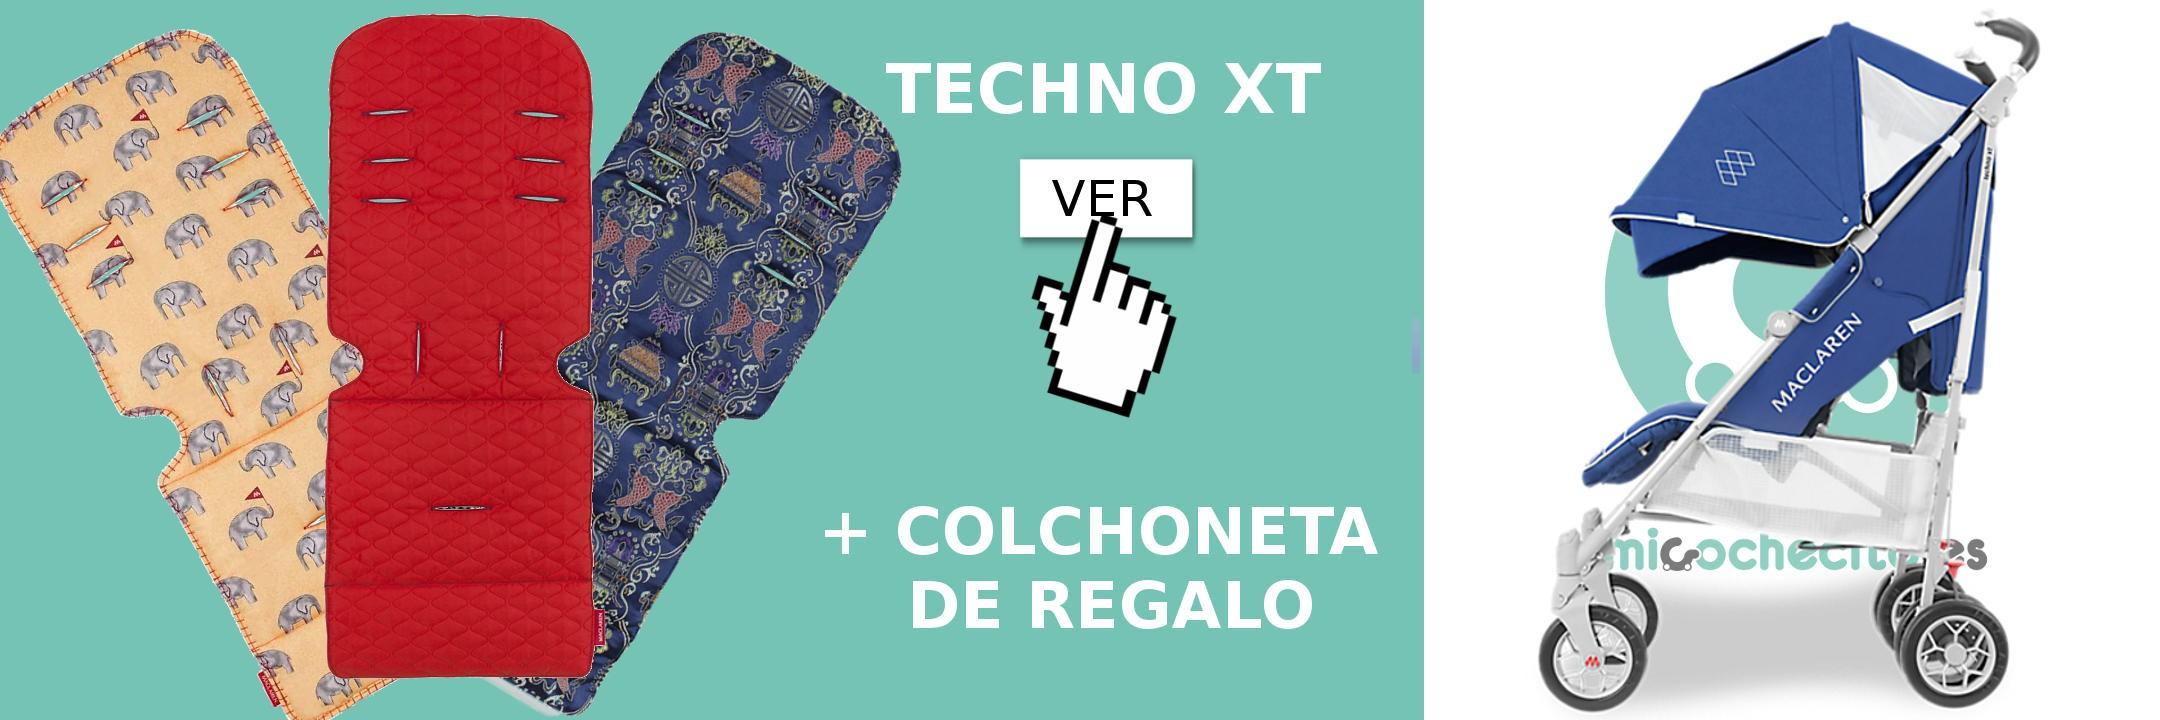 Techno XT + REGALO Colchoneta